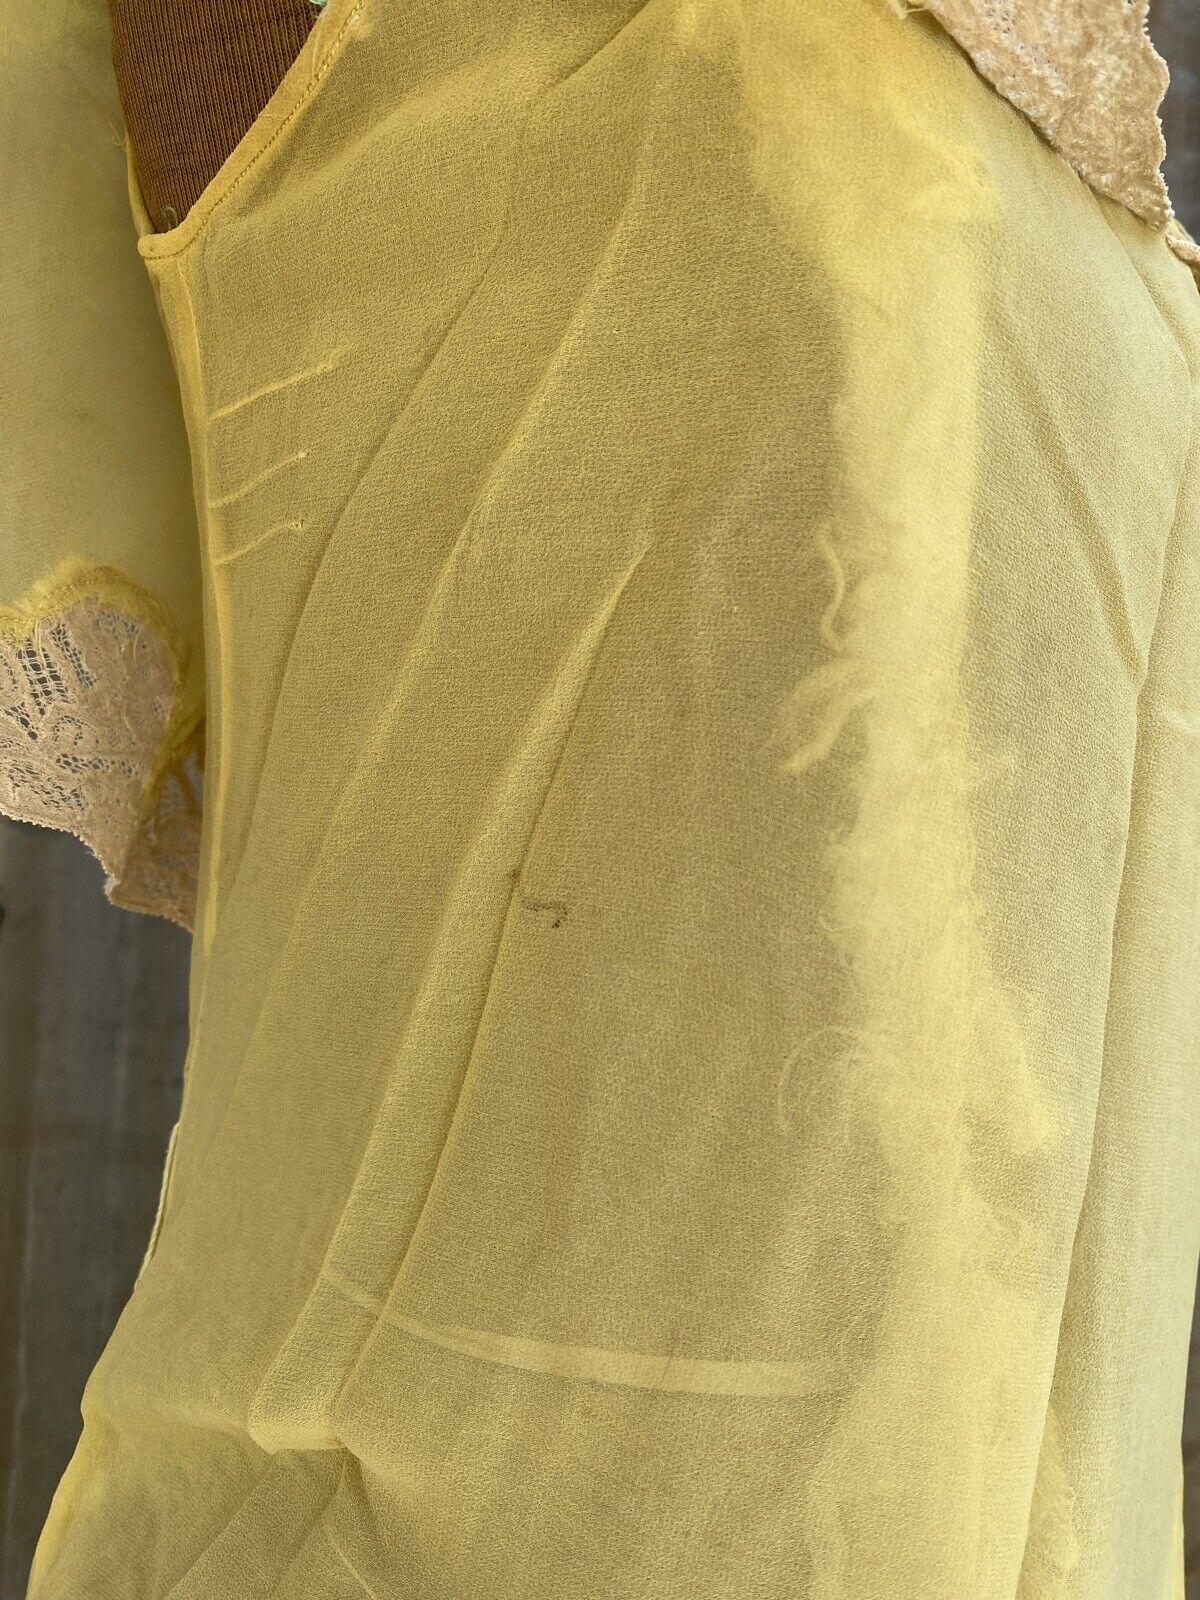 Antique 1920s 1930s Yellow Silk Chiffon Midi Dres… - image 7